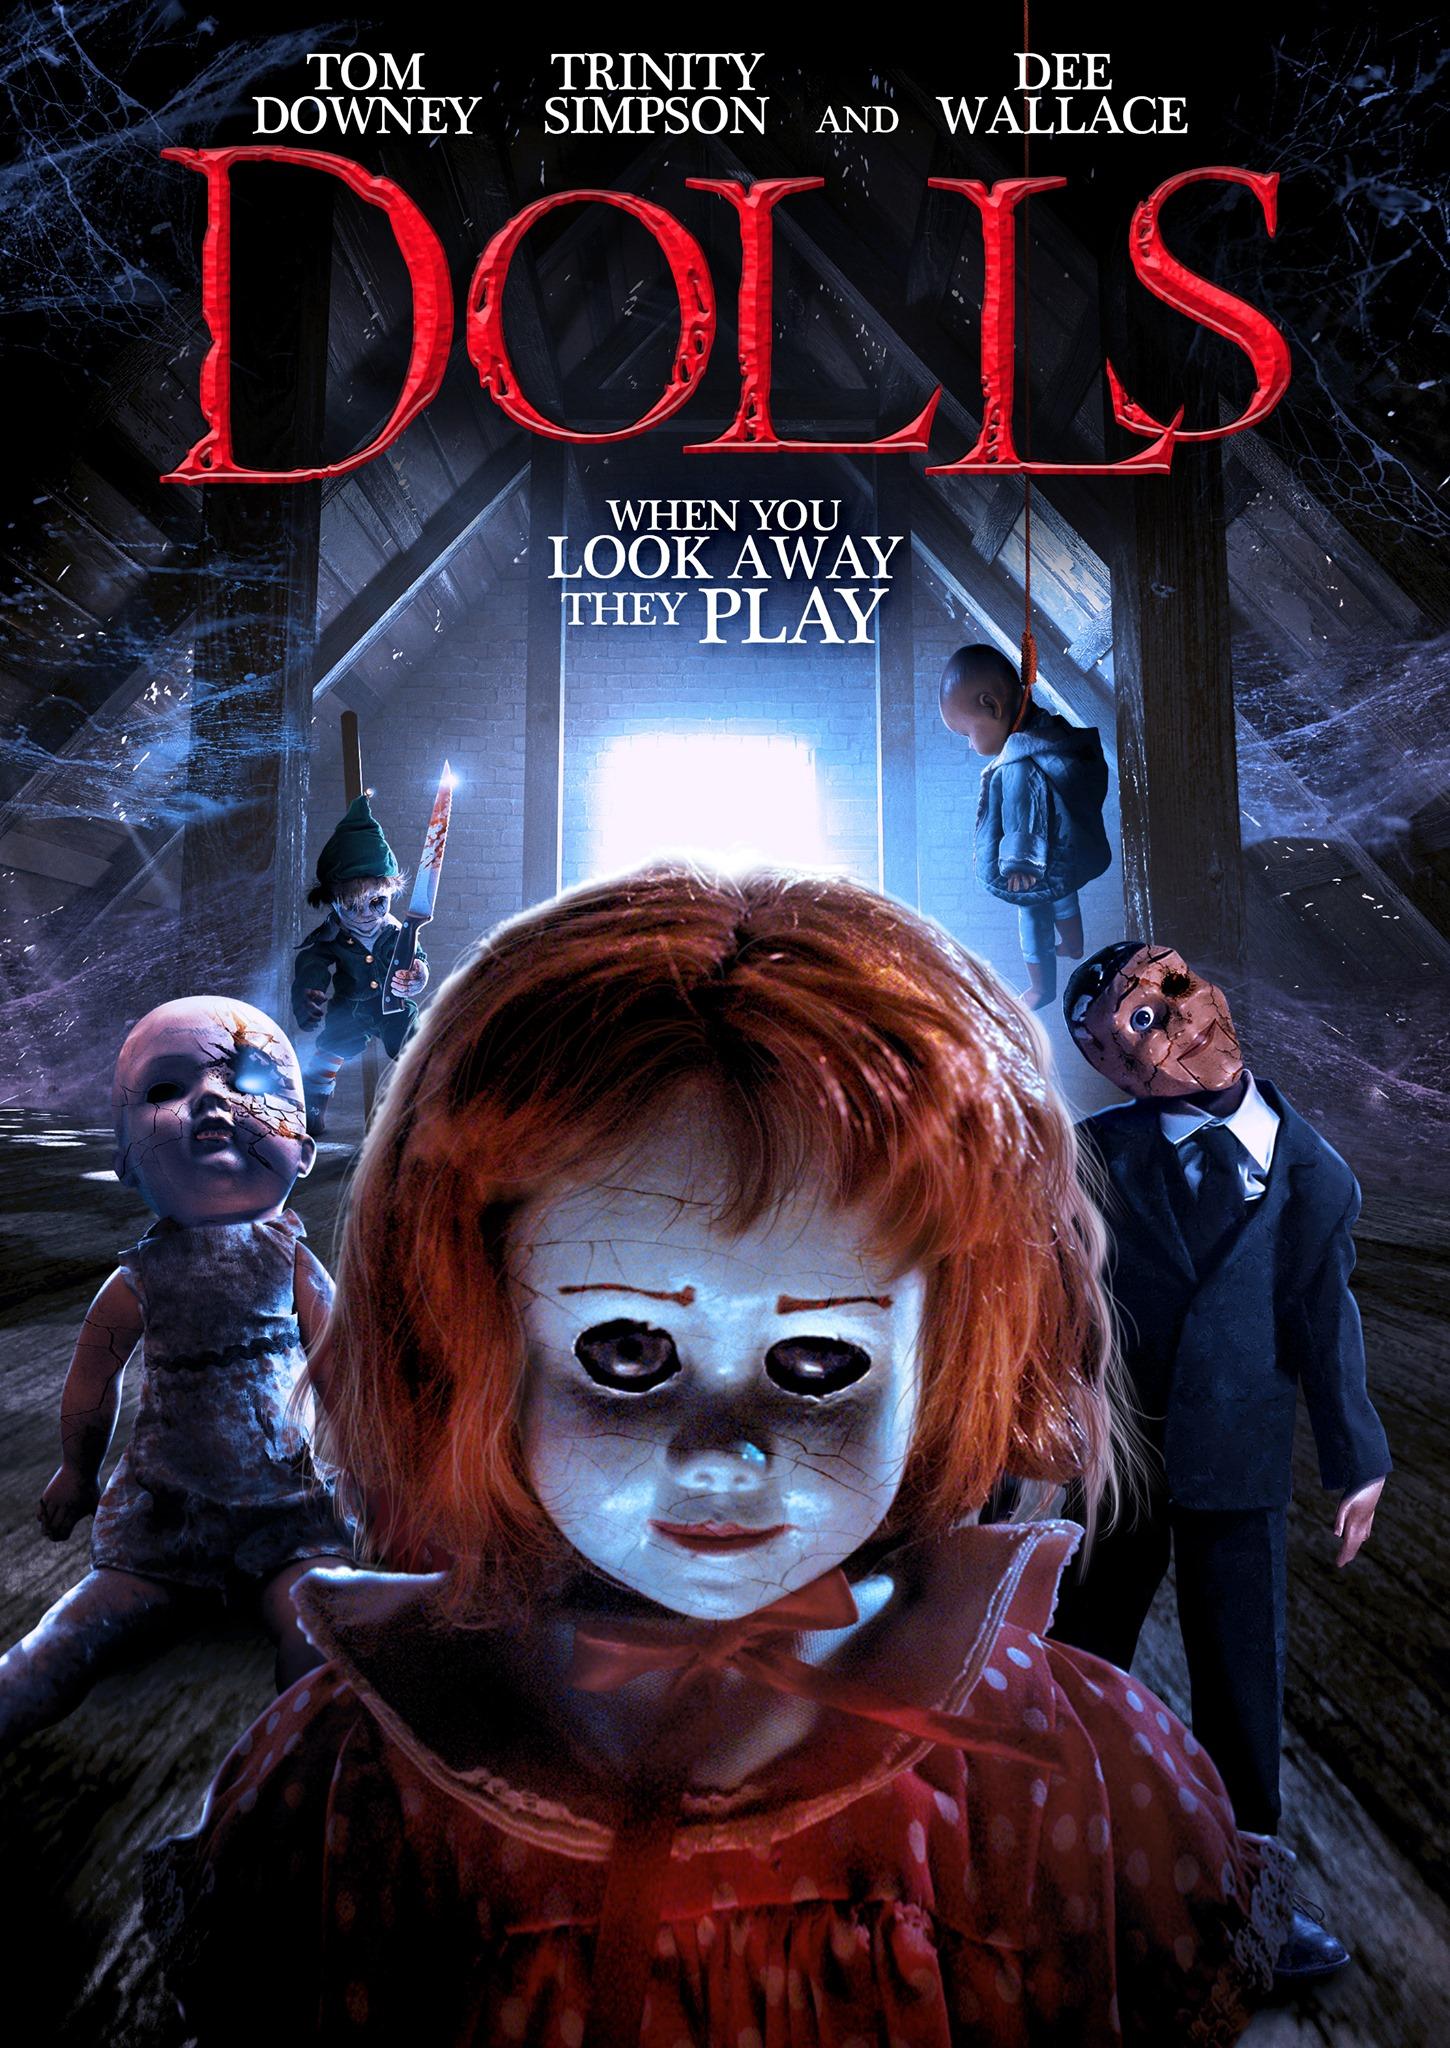 Dolls Final Poster